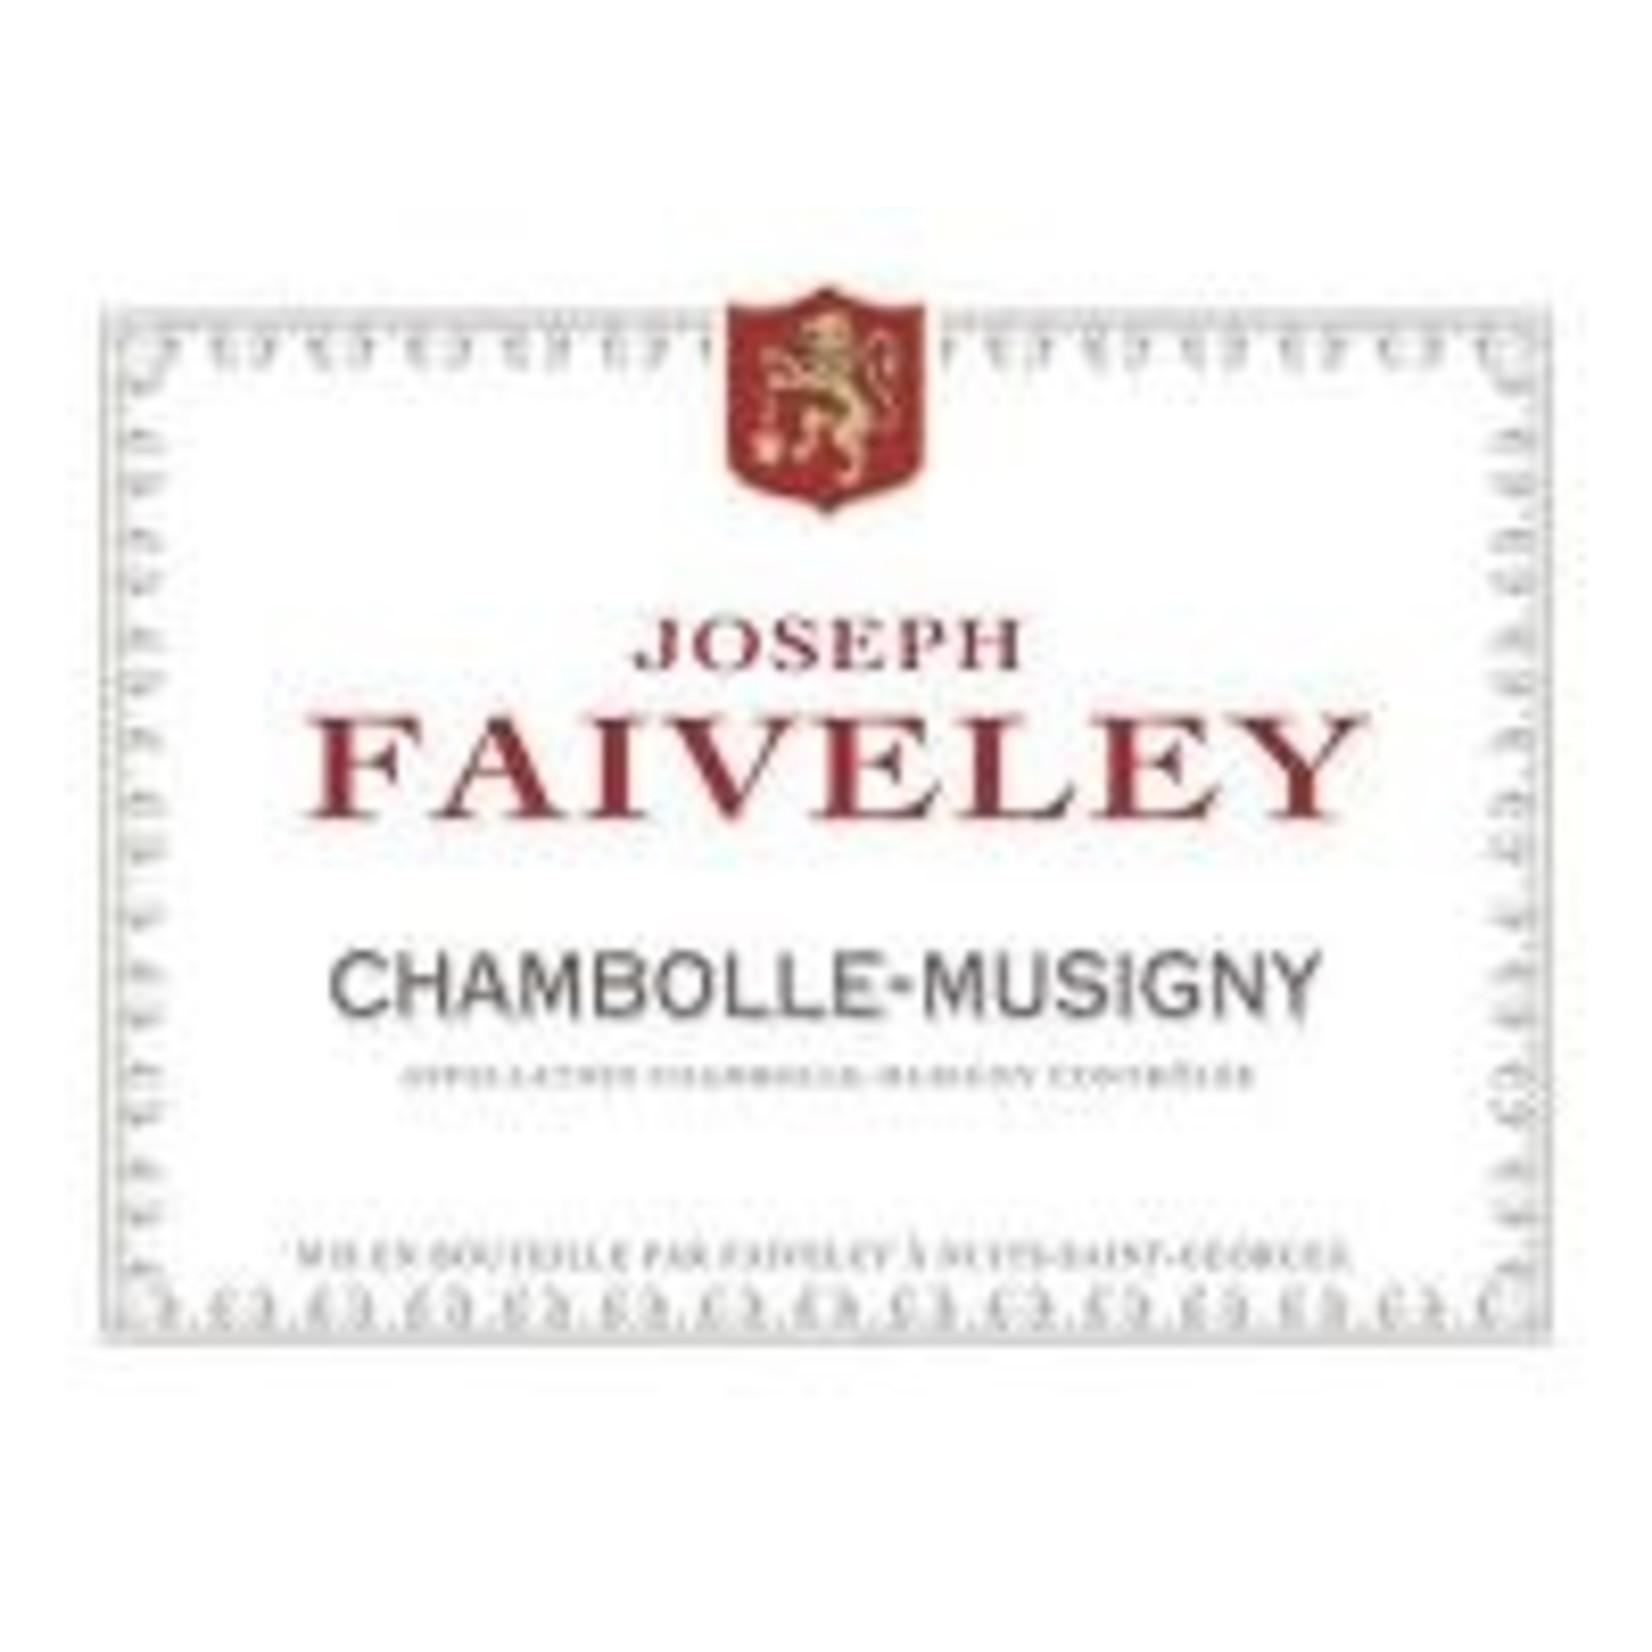 Wine Joseph Faiveley Chambolle Musigny 2012